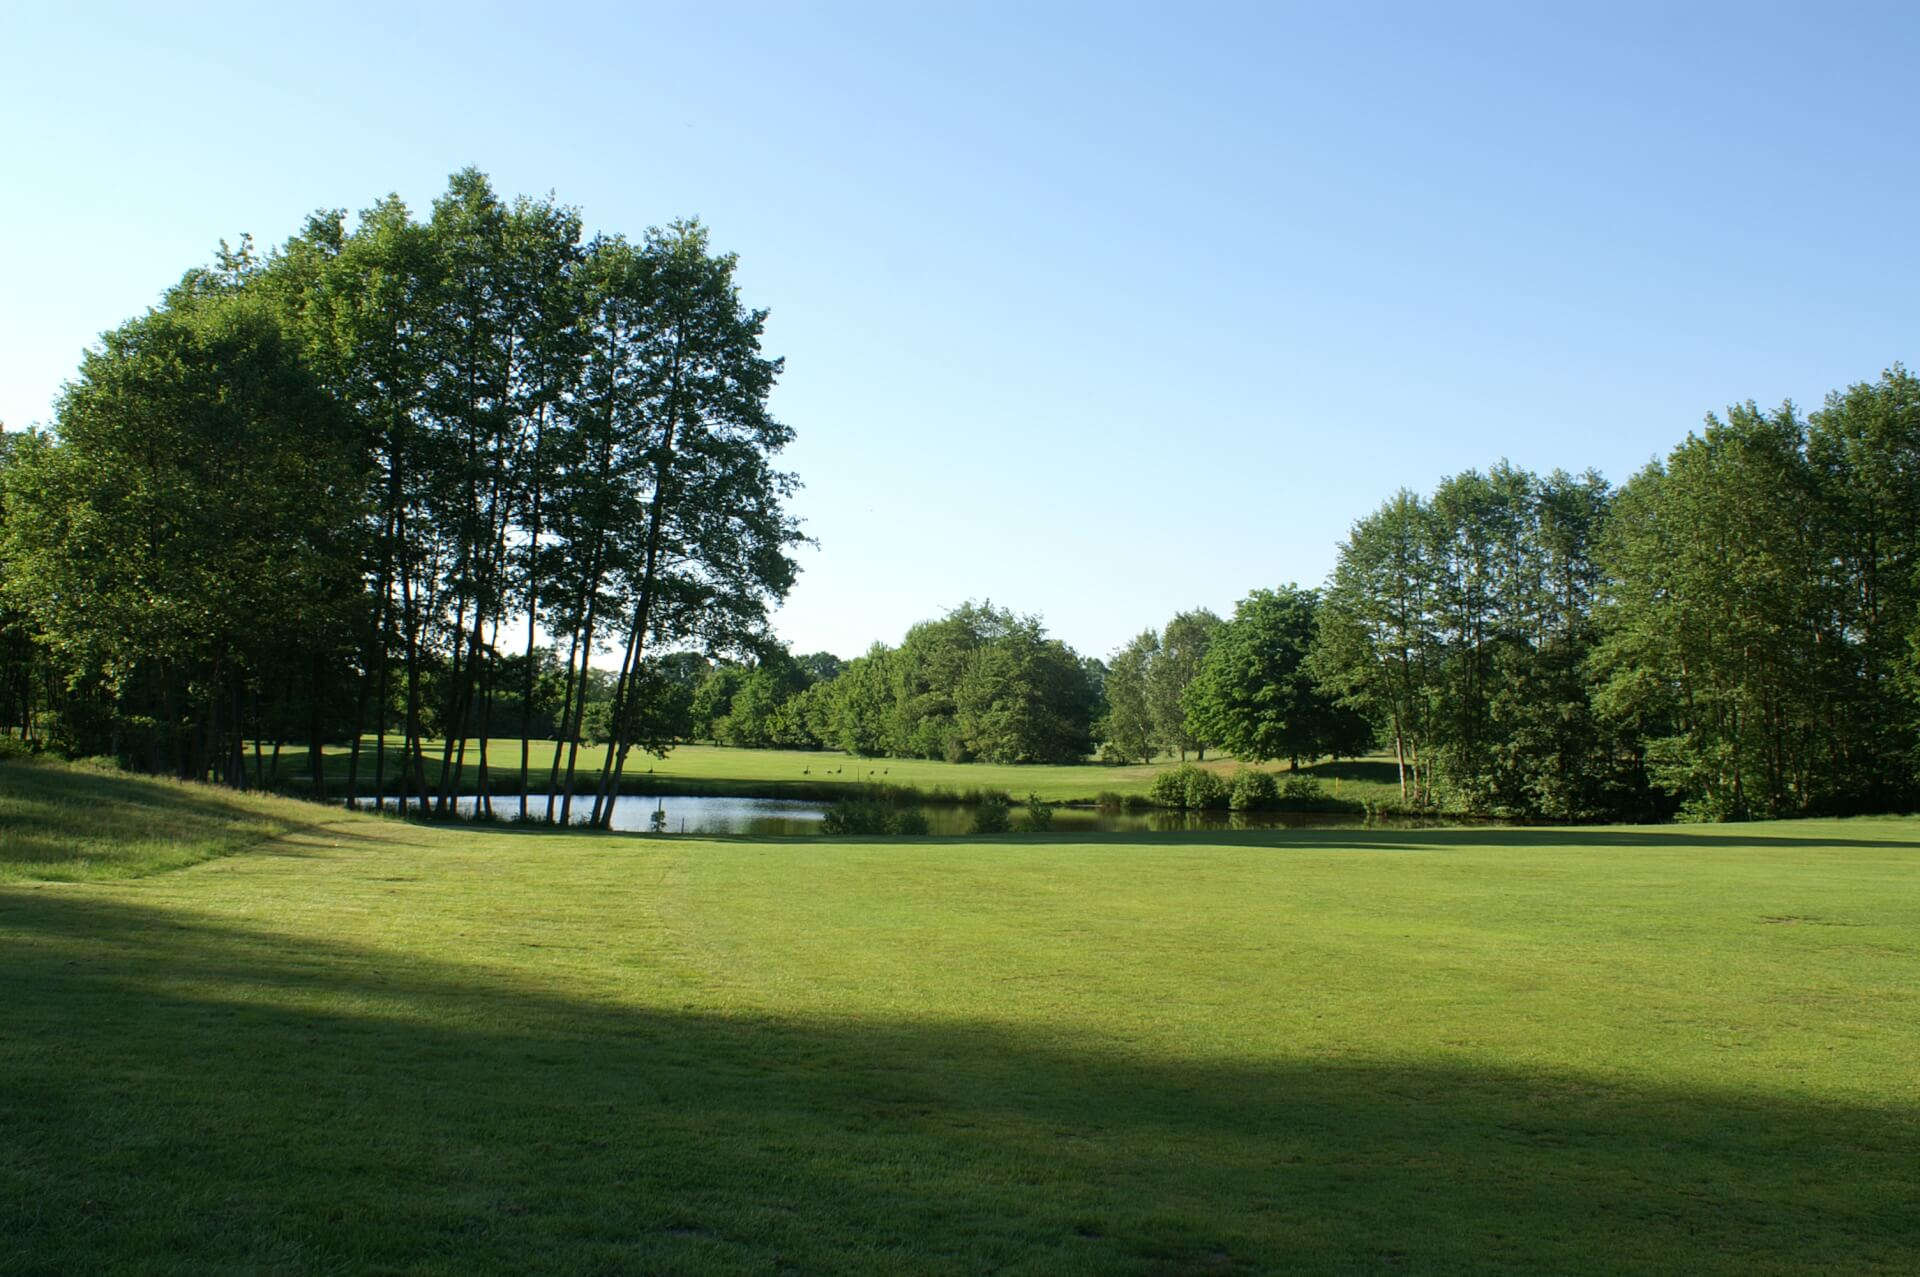 https://golfclub-peckeloh.de/wp-content/uploads/2018/02/PICT0455.jpg